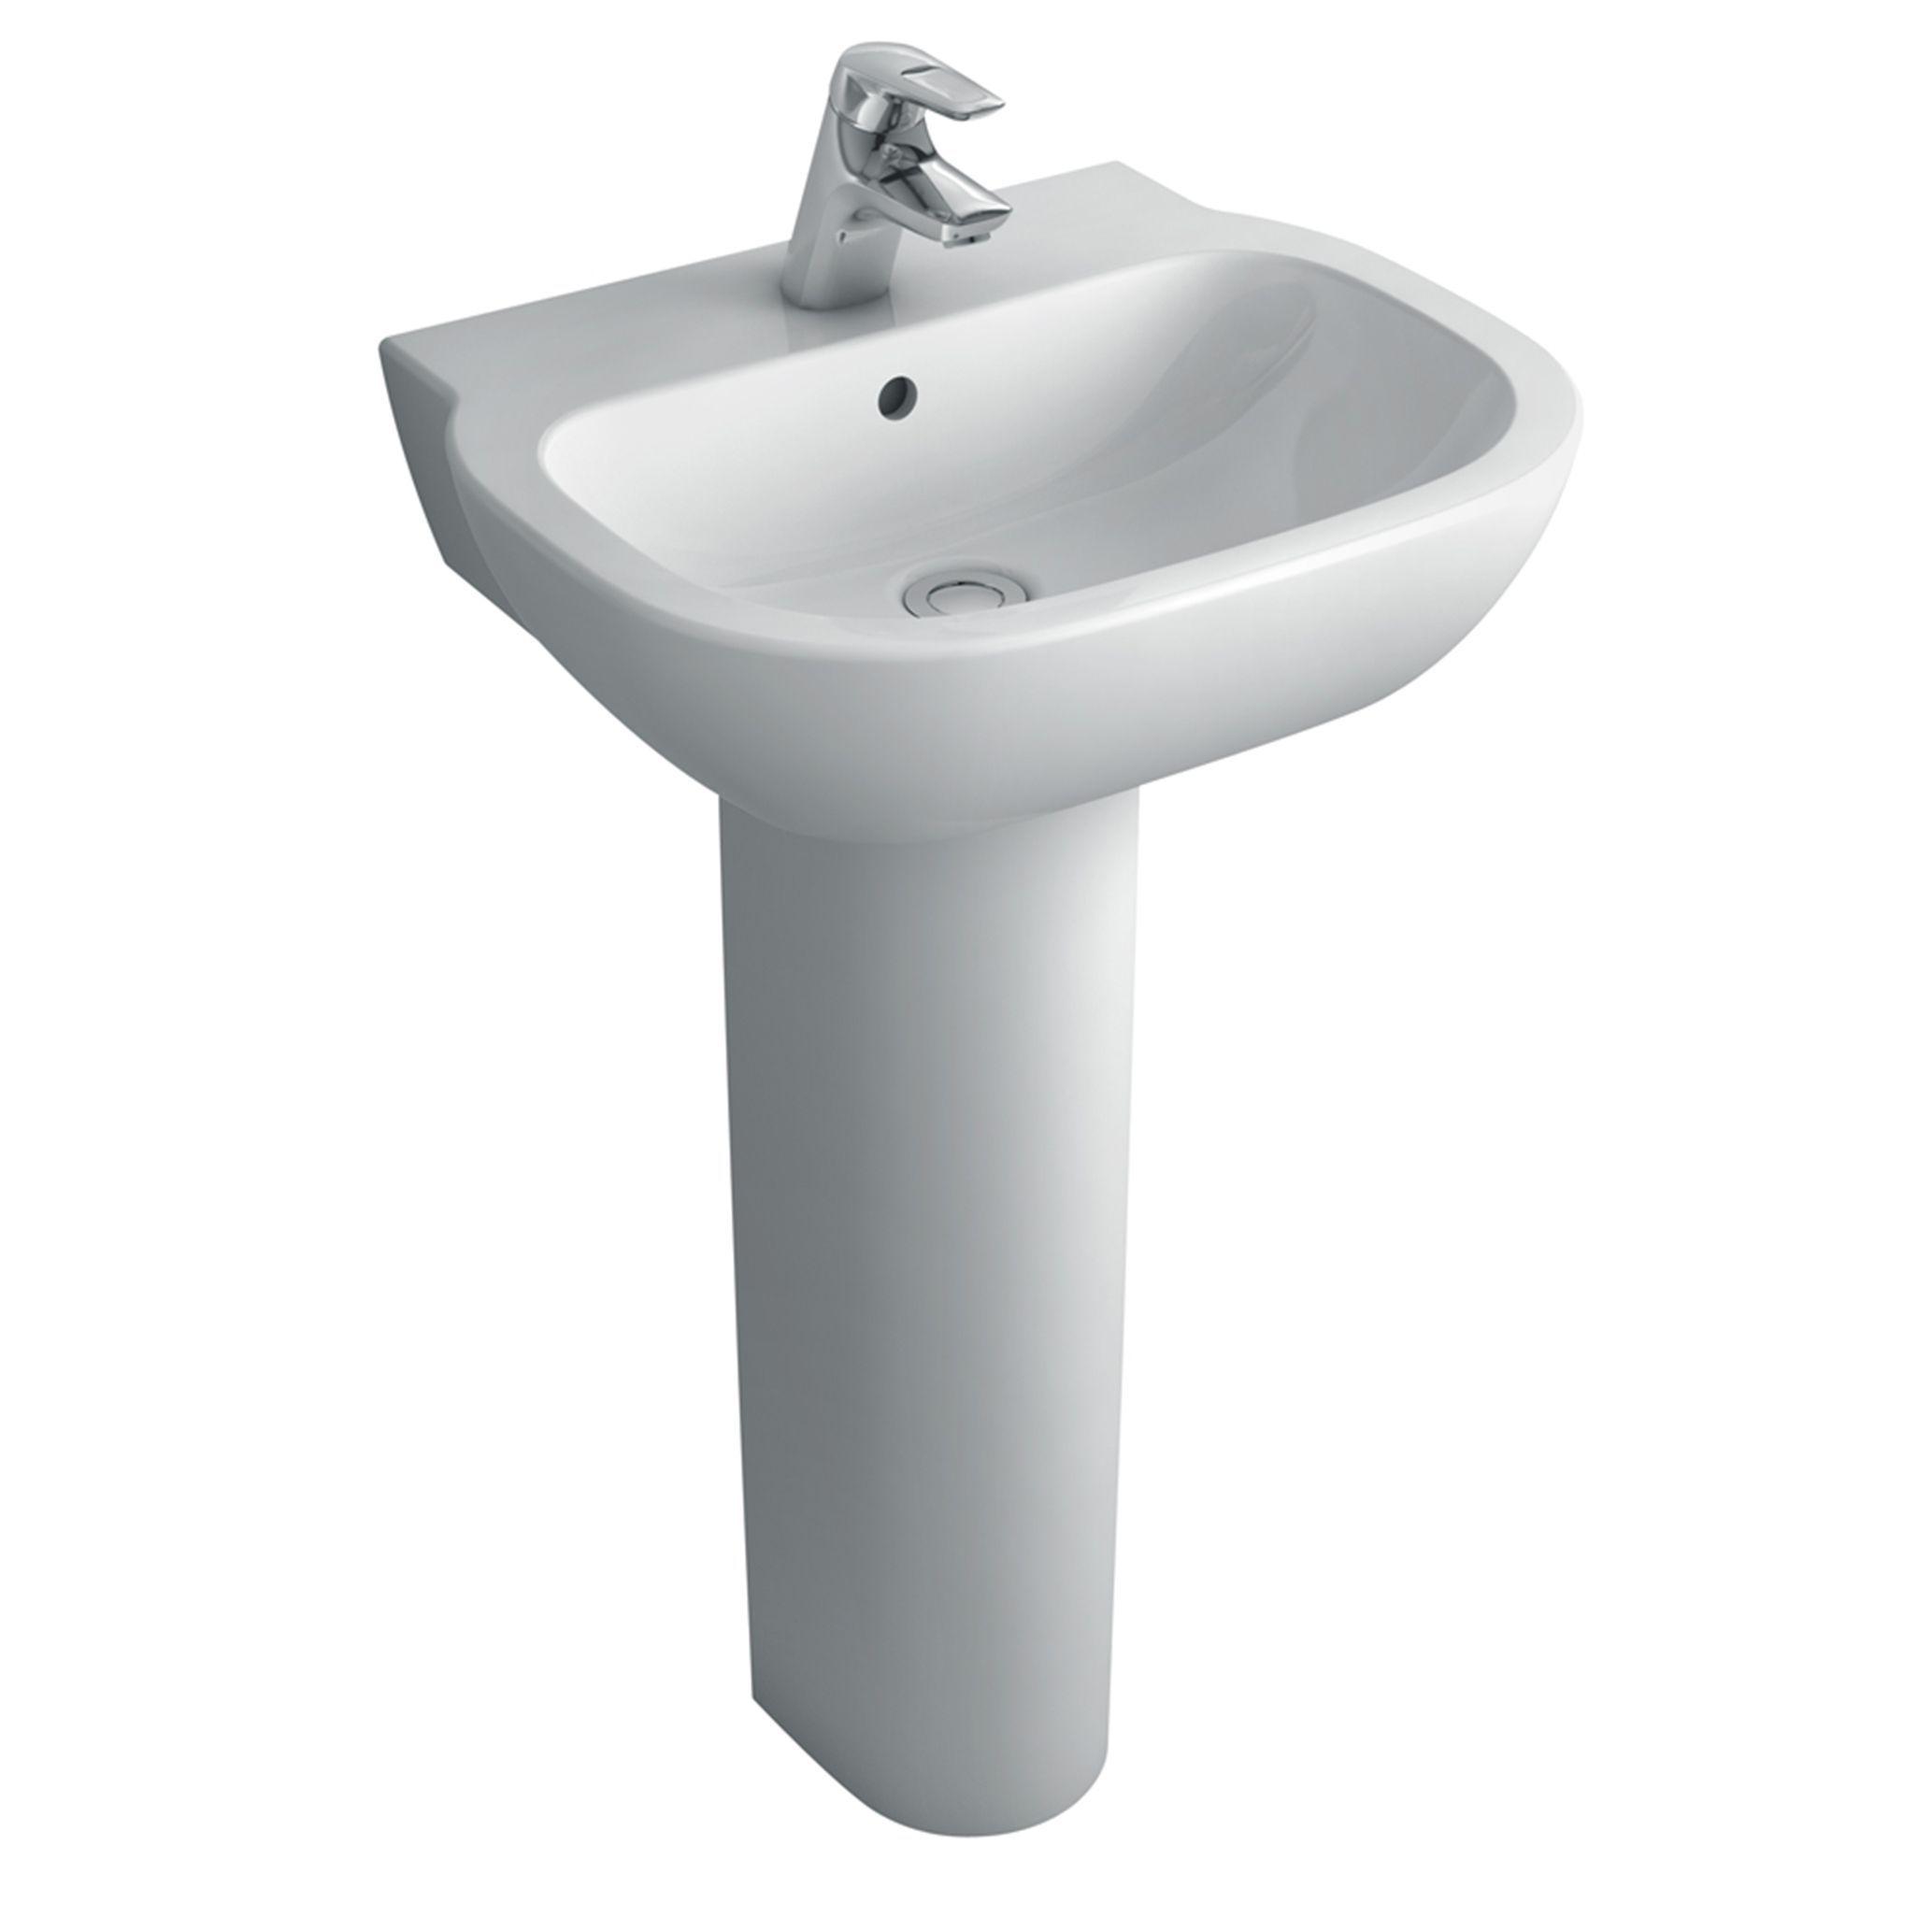 Bathroom Sinks B&Q Ireland ideal standard imagine pedestal basin | departments | diy at b&q